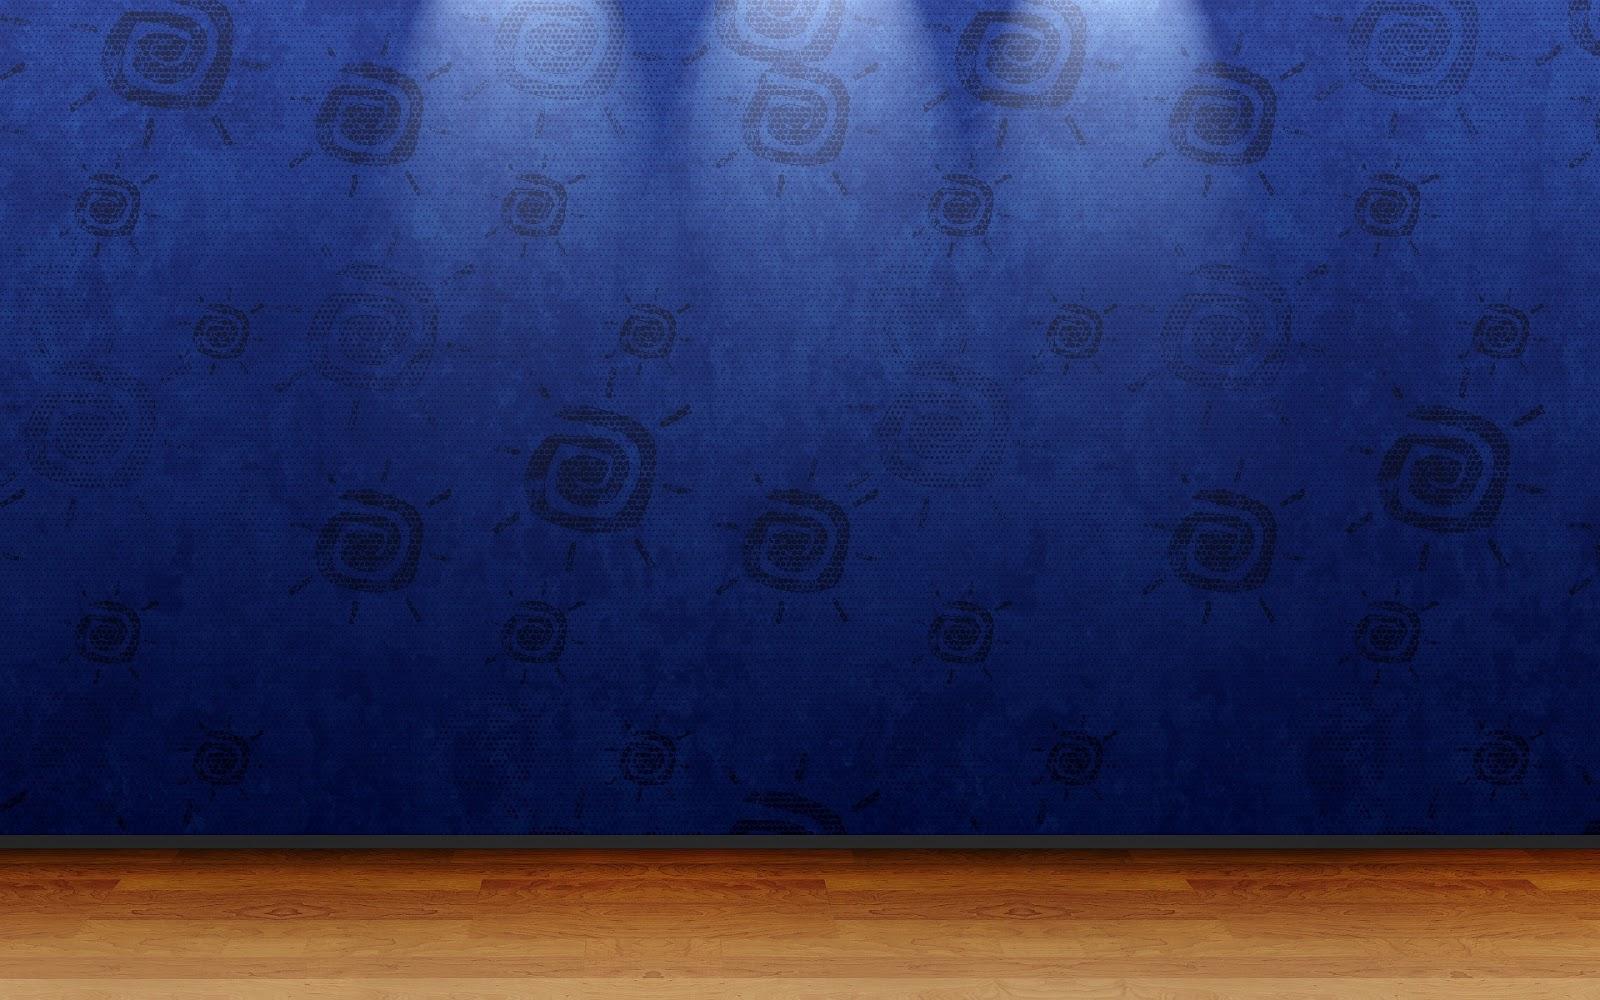 http://1.bp.blogspot.com/-ty46bCOG27U/T18U88U3BJI/AAAAAAAAbgY/BLDSAT4tTJg/s1600/Hd-wallpapers-achtergronden-voor-windows-7-windows-vista-en-mac-os-29.jpg